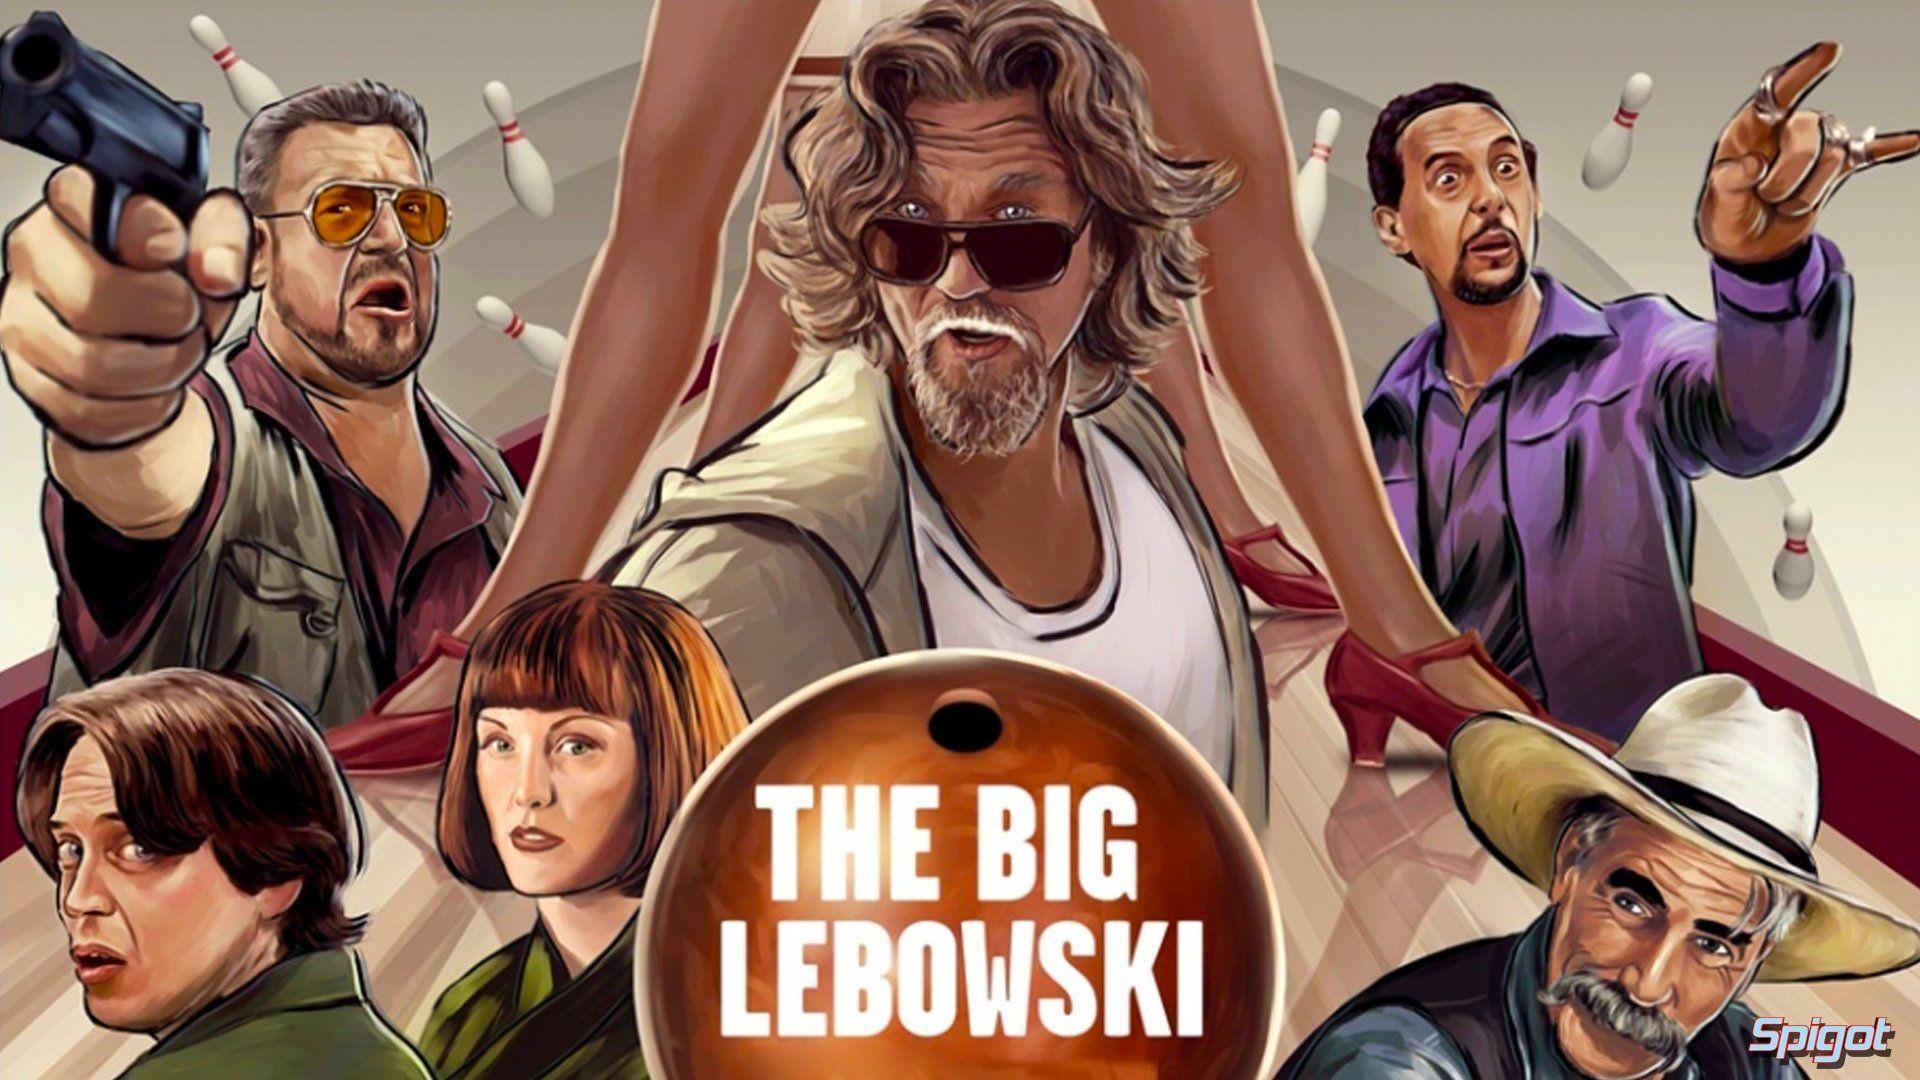 The big lebowski dude film wallpaper